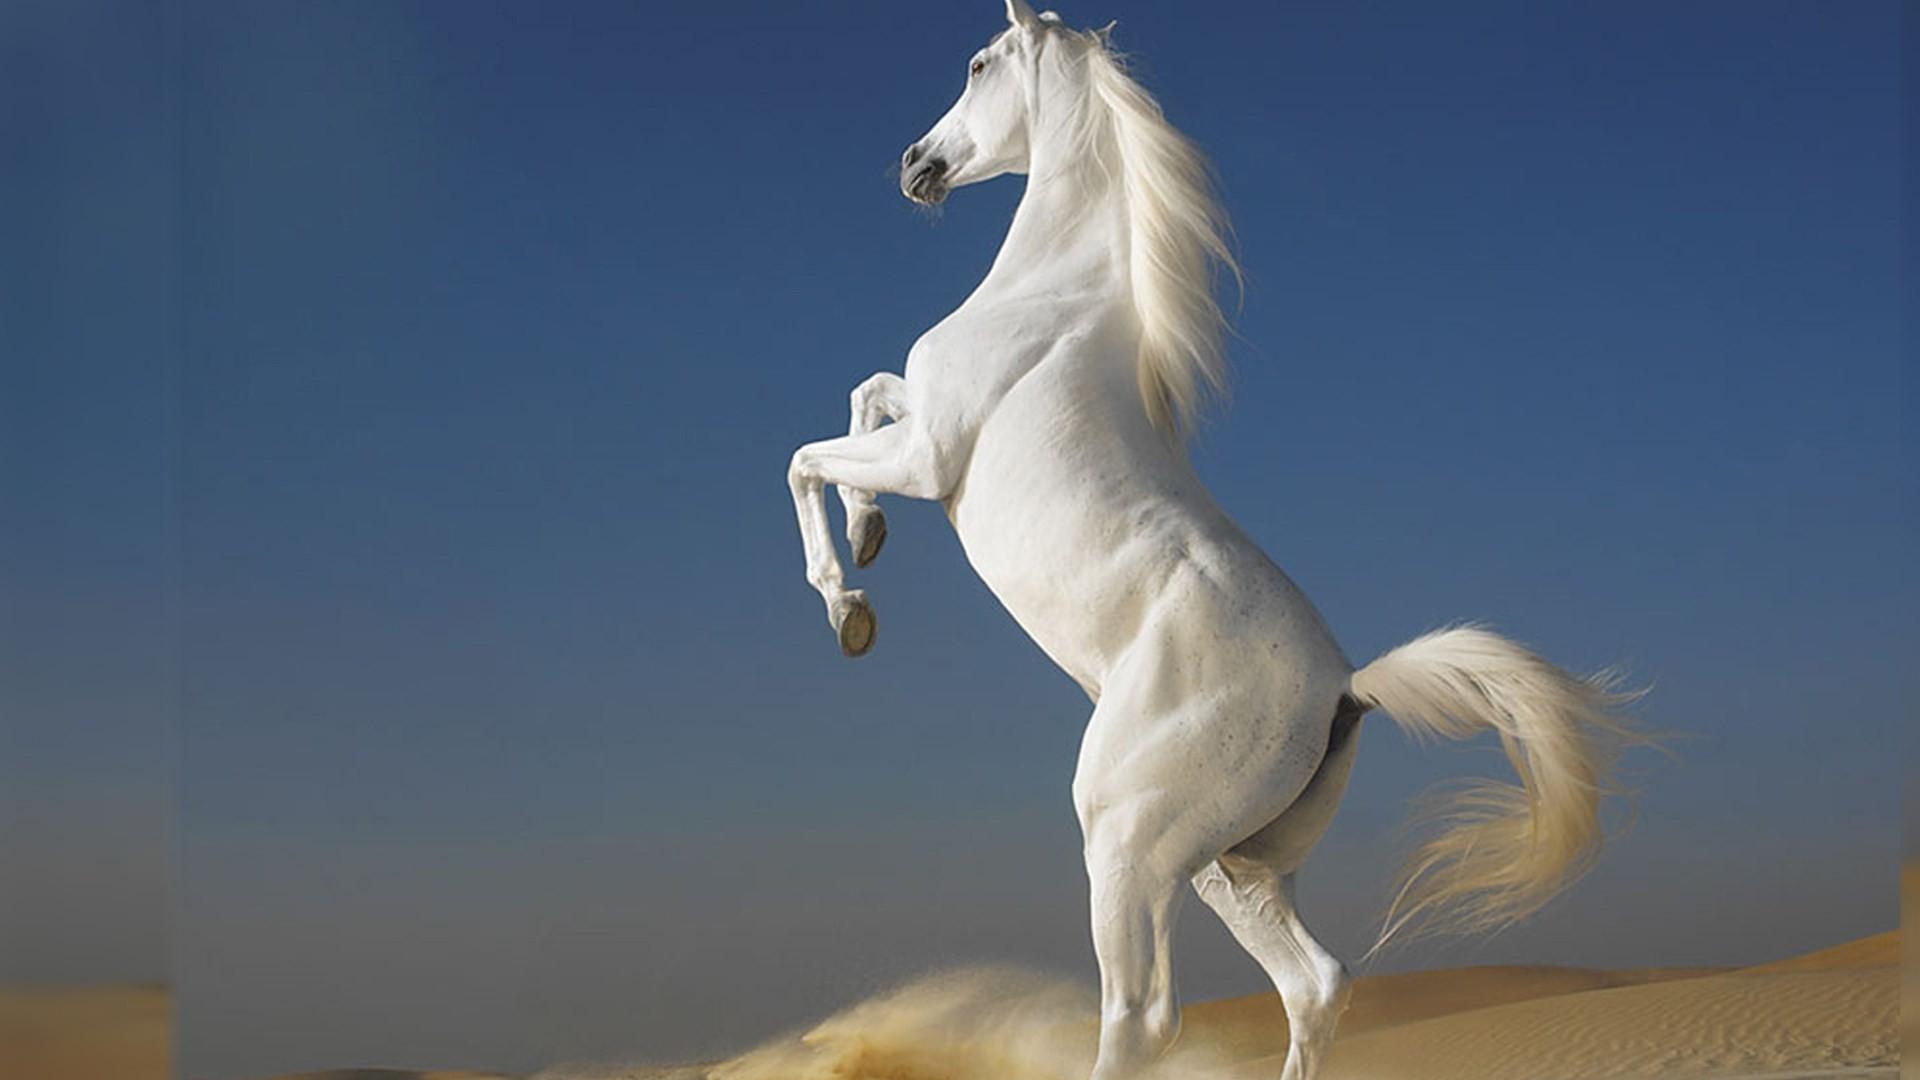 white horse best hd desktop wallpapers free